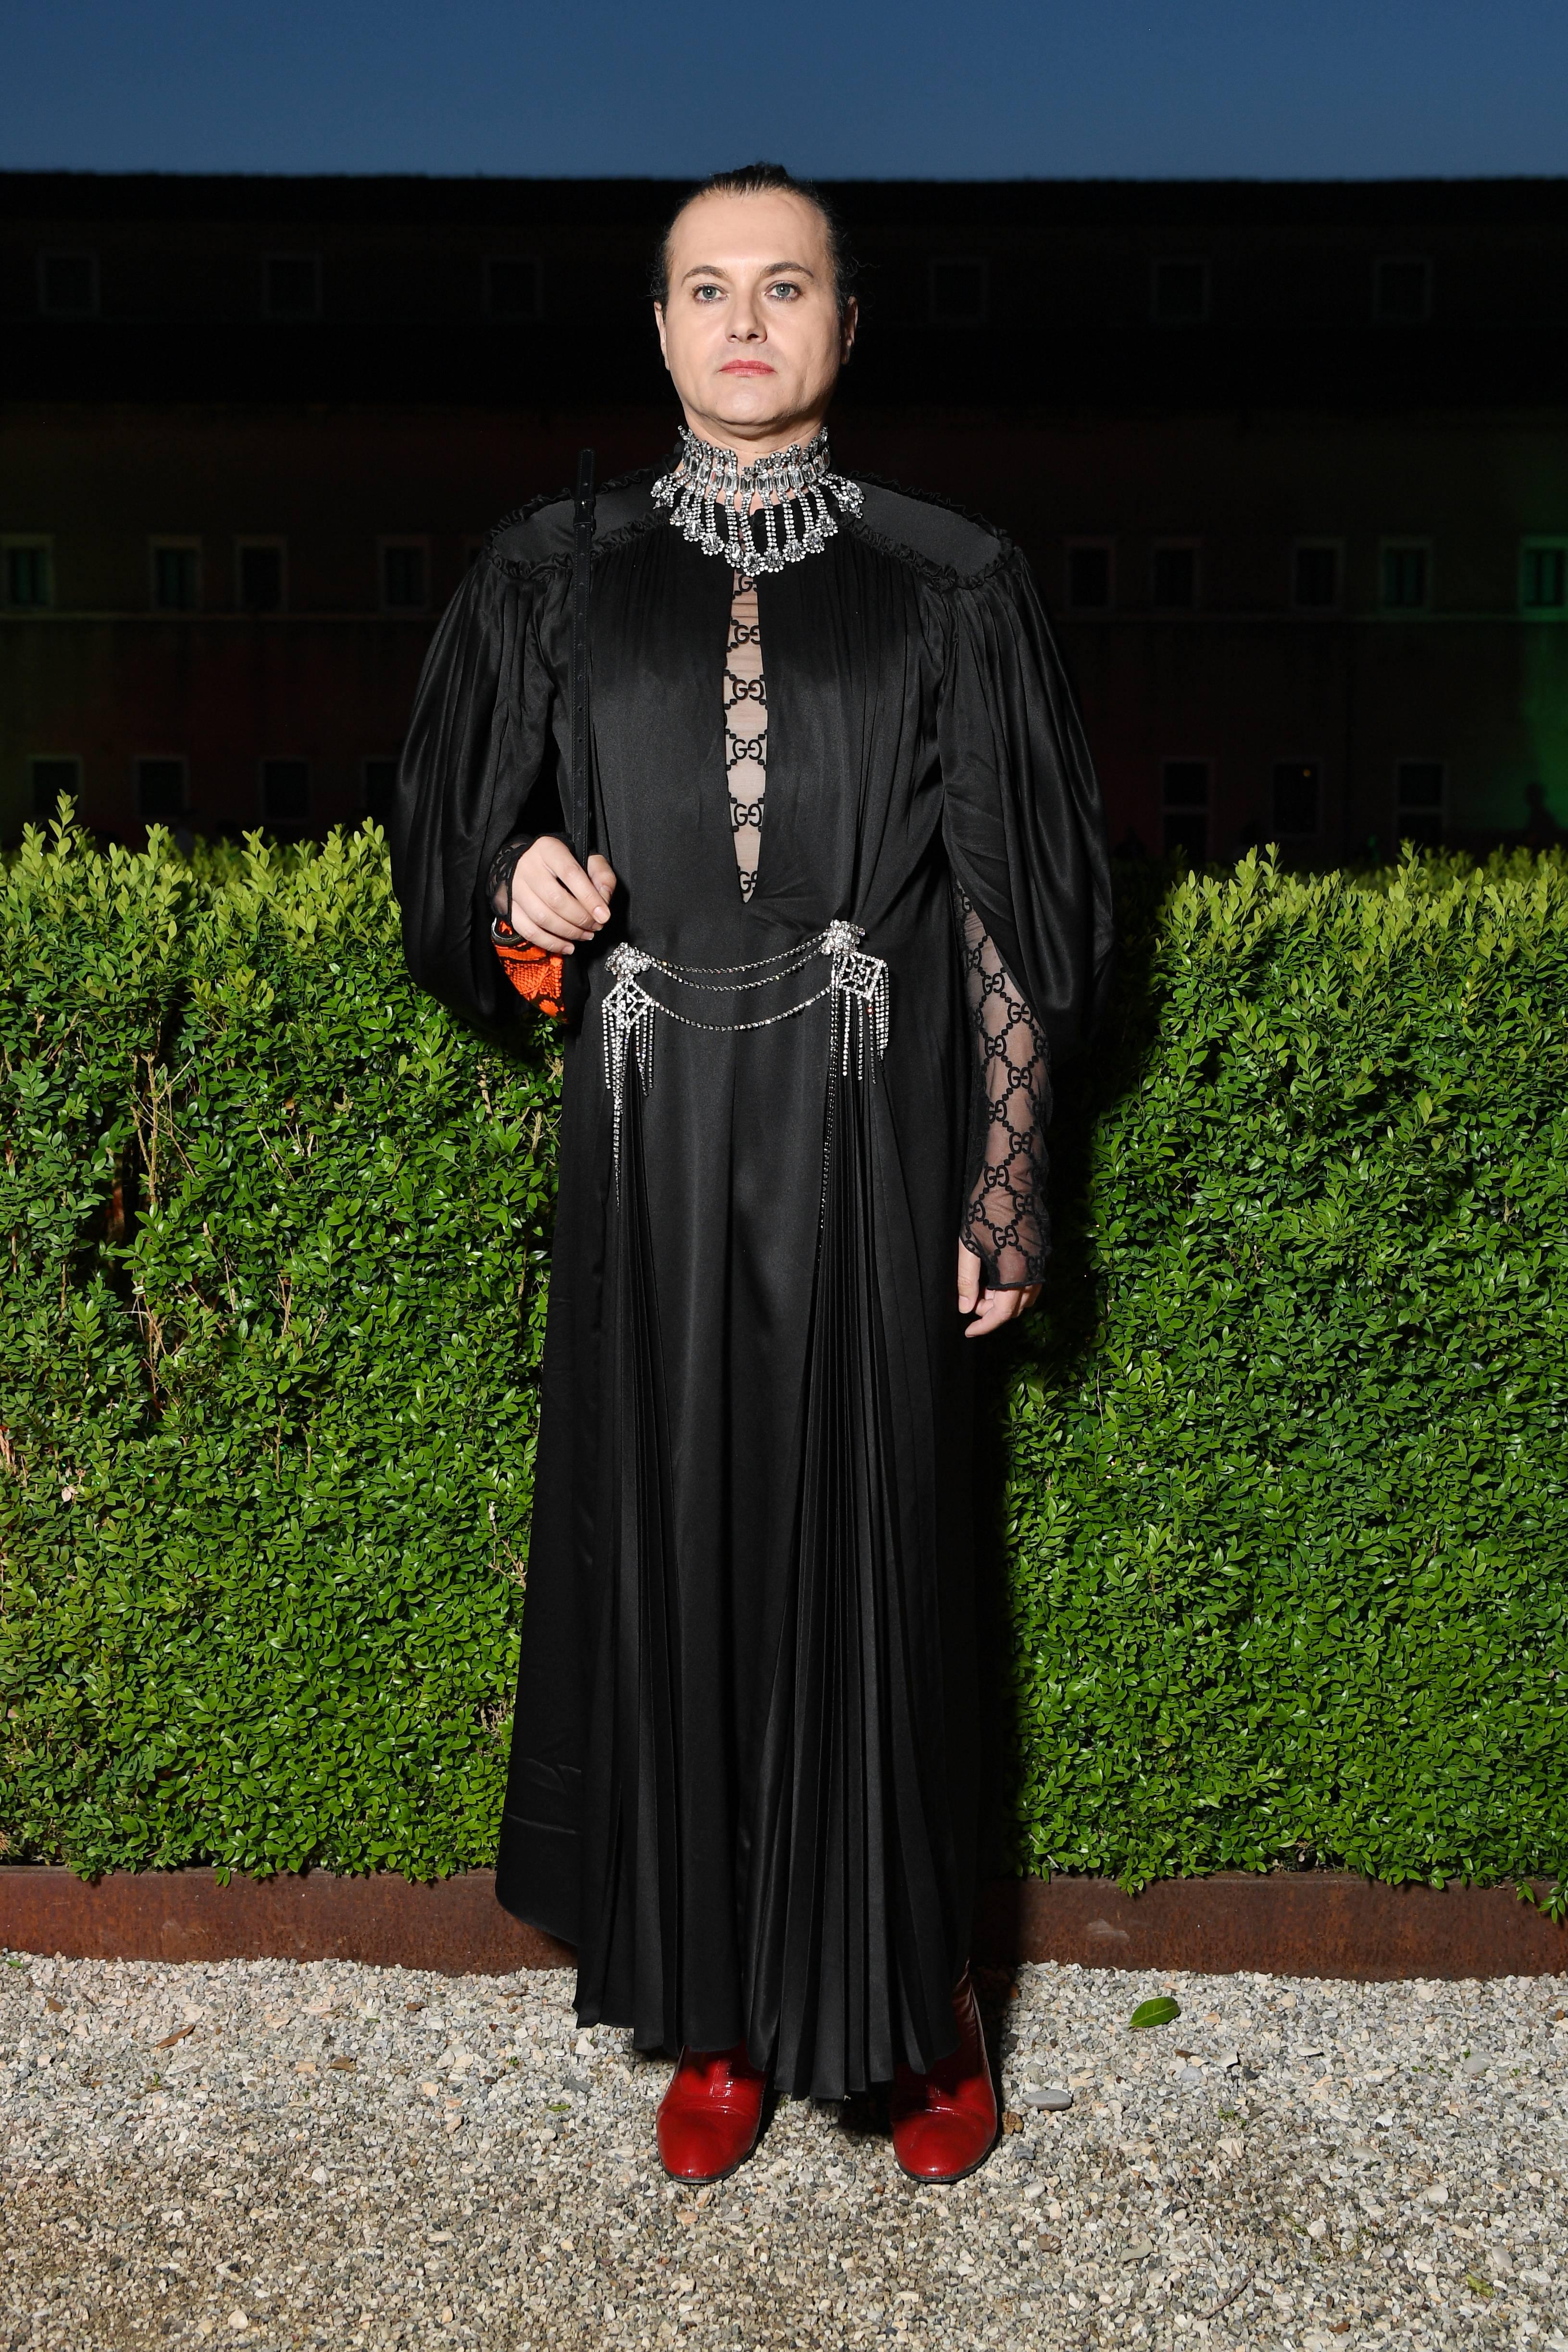 Milovan Farronato foi o prestigiado no jantar de gala da Gucci. (crédito: Daniele Venturelli/Daniele Venturelli/ Getty Images for Gucci)